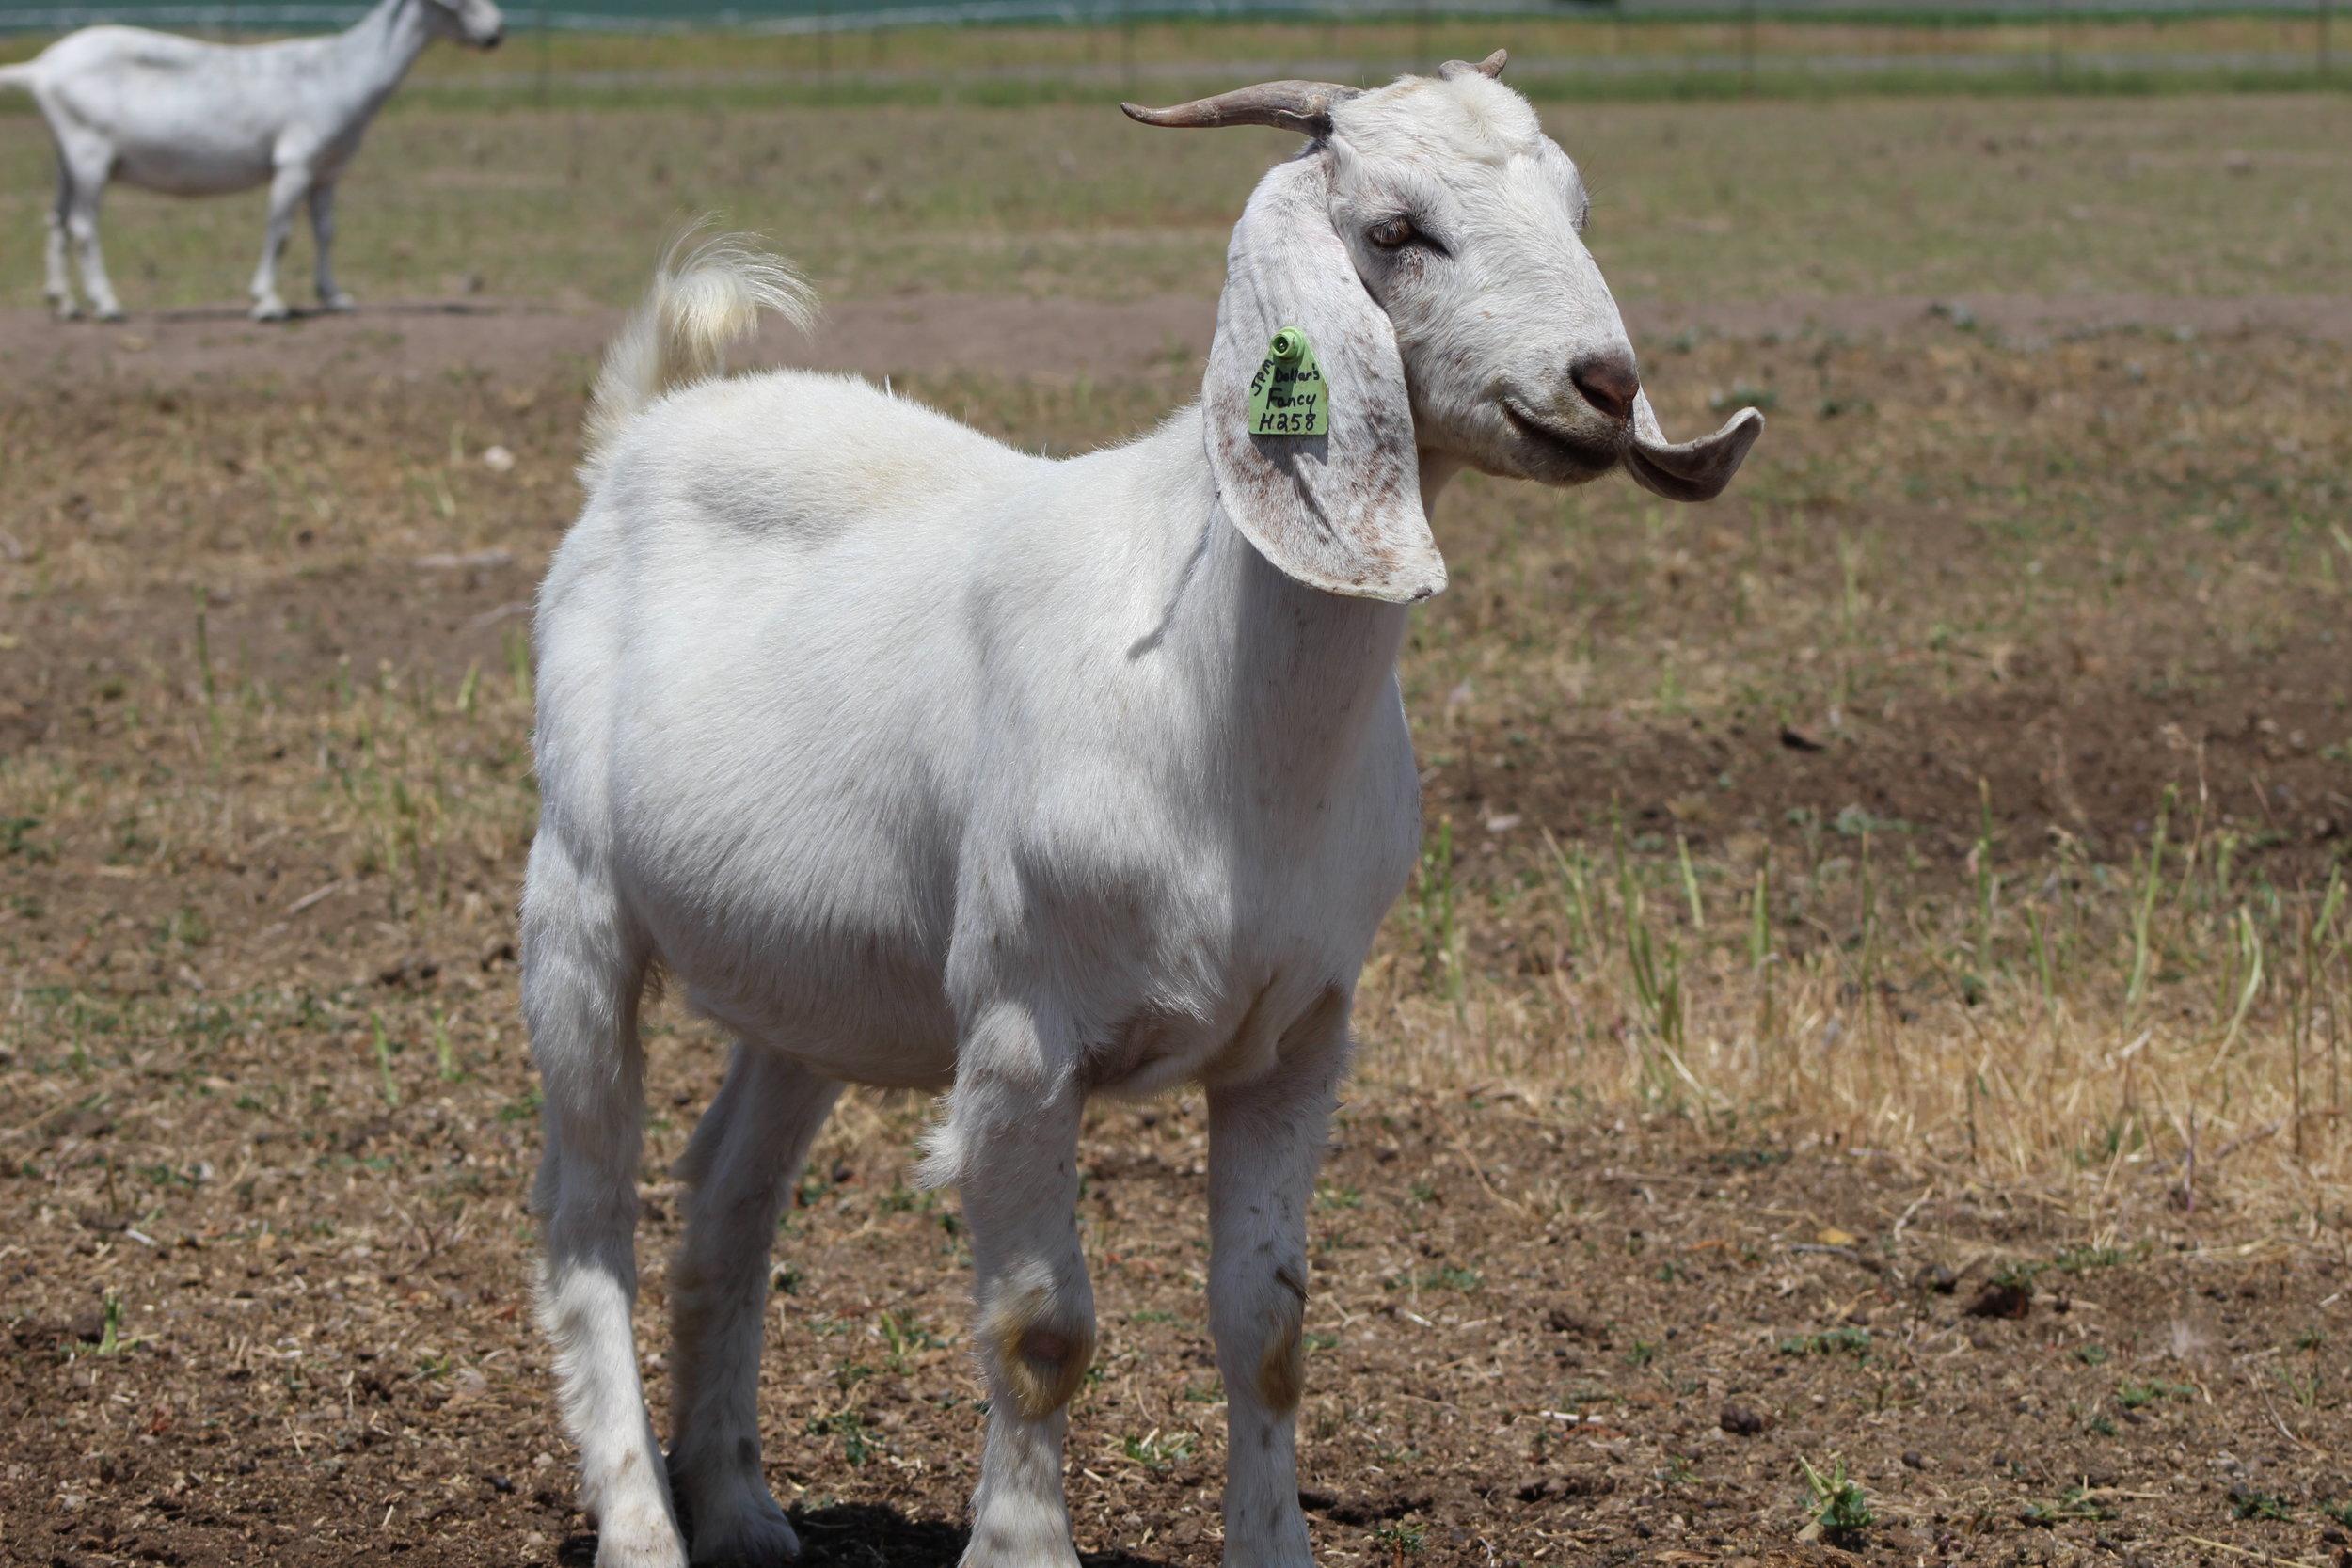 JPM Dollar's Fancy   100% Fullblood/DNA-P Register Savanna  Dam:GCS Faith  Sire: MGF A 102 Dollar  Date of Birth:9/1/2018  Littersize: E.T.  Birth Weight:  Weaning Weight:  ADG:  CAE, Cl, Johannes clean herd